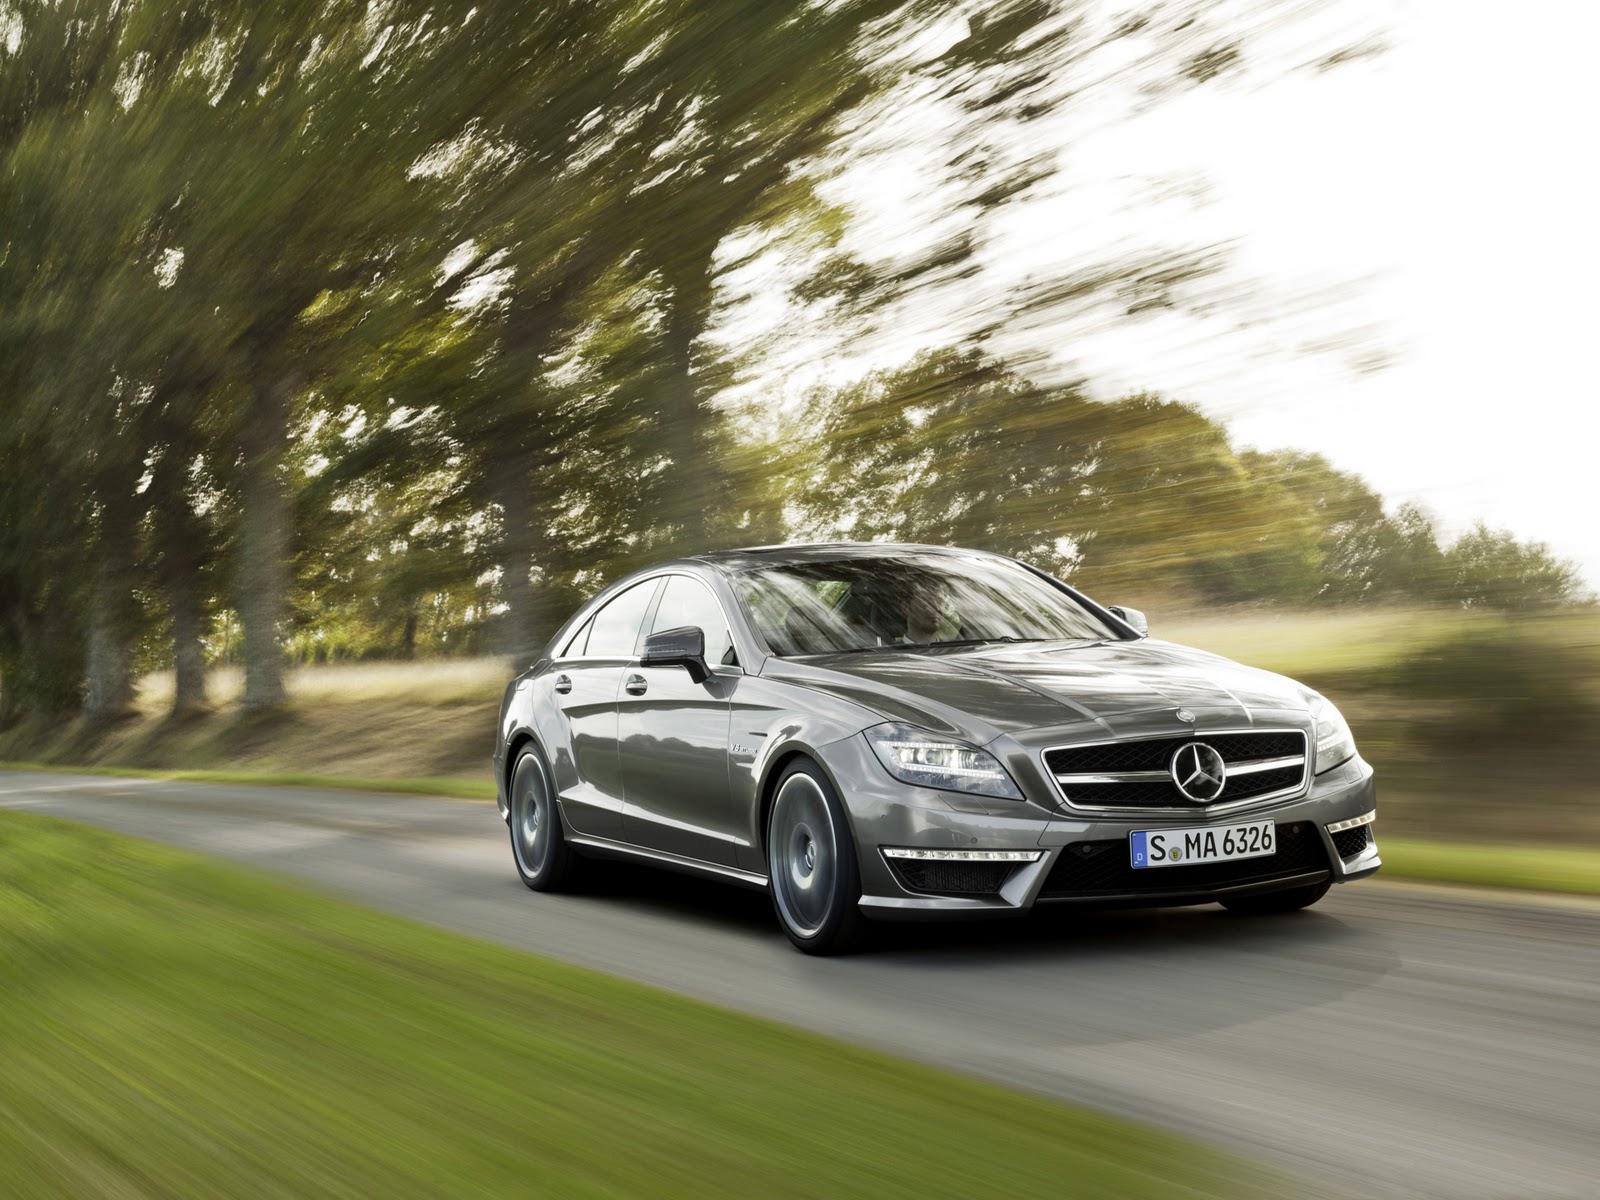 http://3.bp.blogspot.com/_viCh1SFyGrA/TO1vKae4NiI/AAAAAAAAAJo/3GsQ2UOiWcU/s1600/2011-Mercedes-Benz-CLS-63-AMG-Front-Angle-Speed-3-1920x1440.jpg